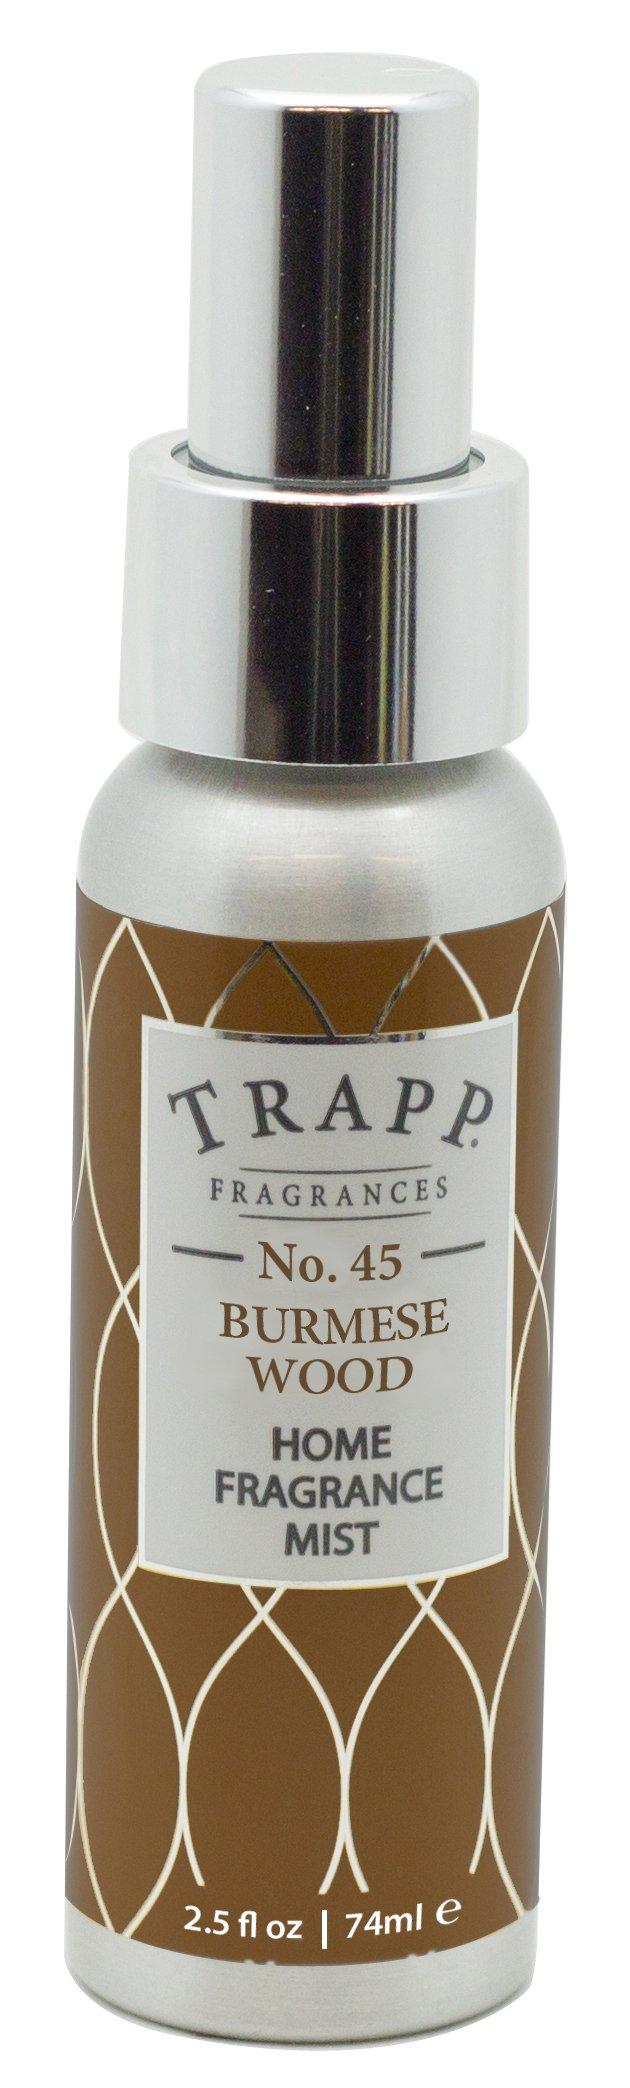 Trapp Candles Home Fragrance Mist, No. 45 Burmese Wood, 2.5-Ounce